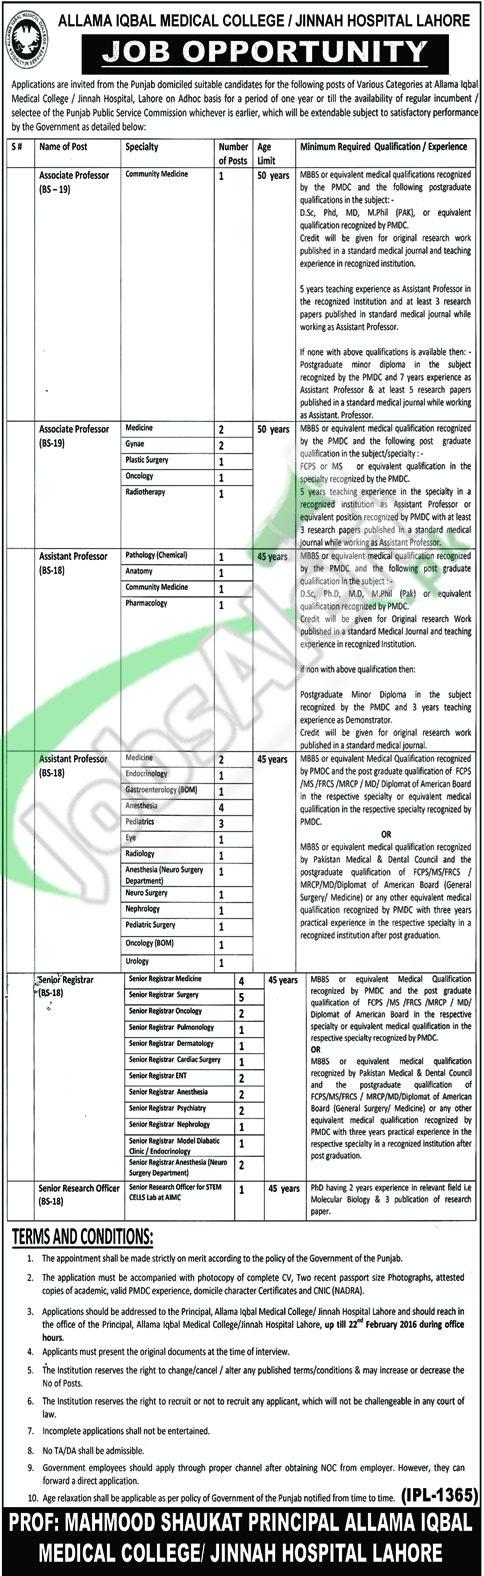 Allama Iqbal Medical College 06 February 2016 Recruitment Offers